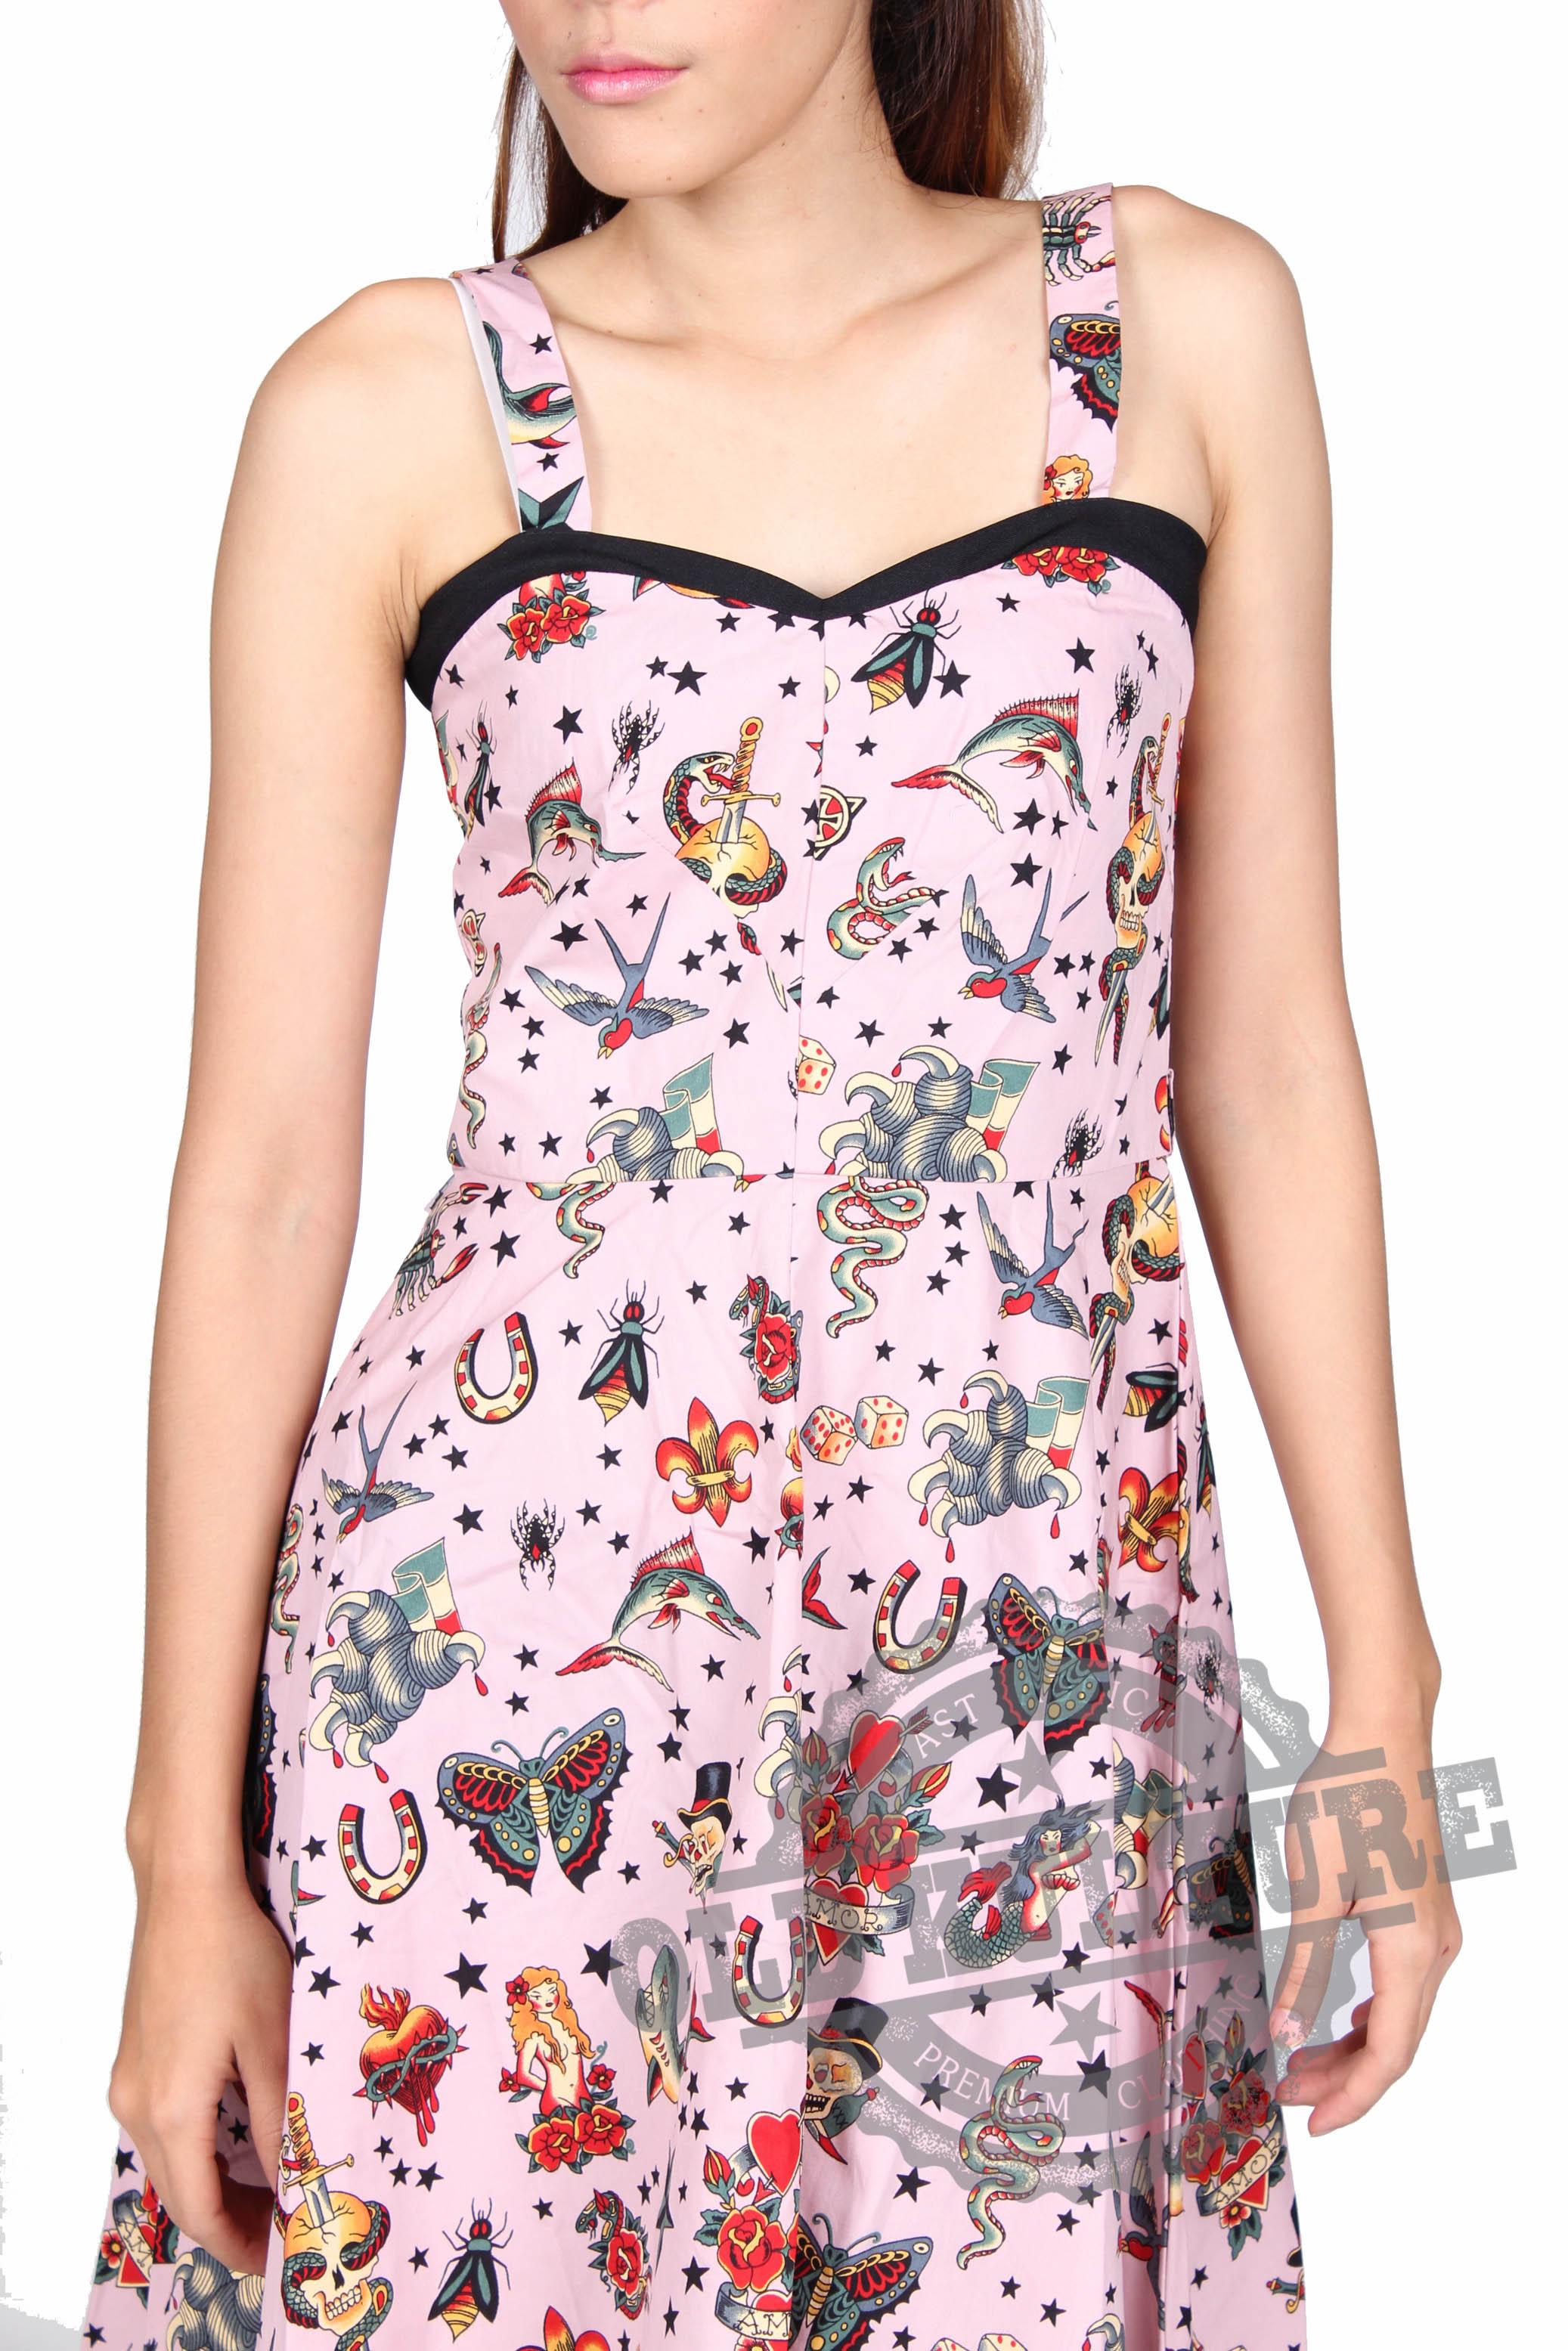 rockabilly_women_dress_skull_roses_retro_vintage_pin_up_cocktail_prom_party_unique_design_d17_dresses_2.JPG